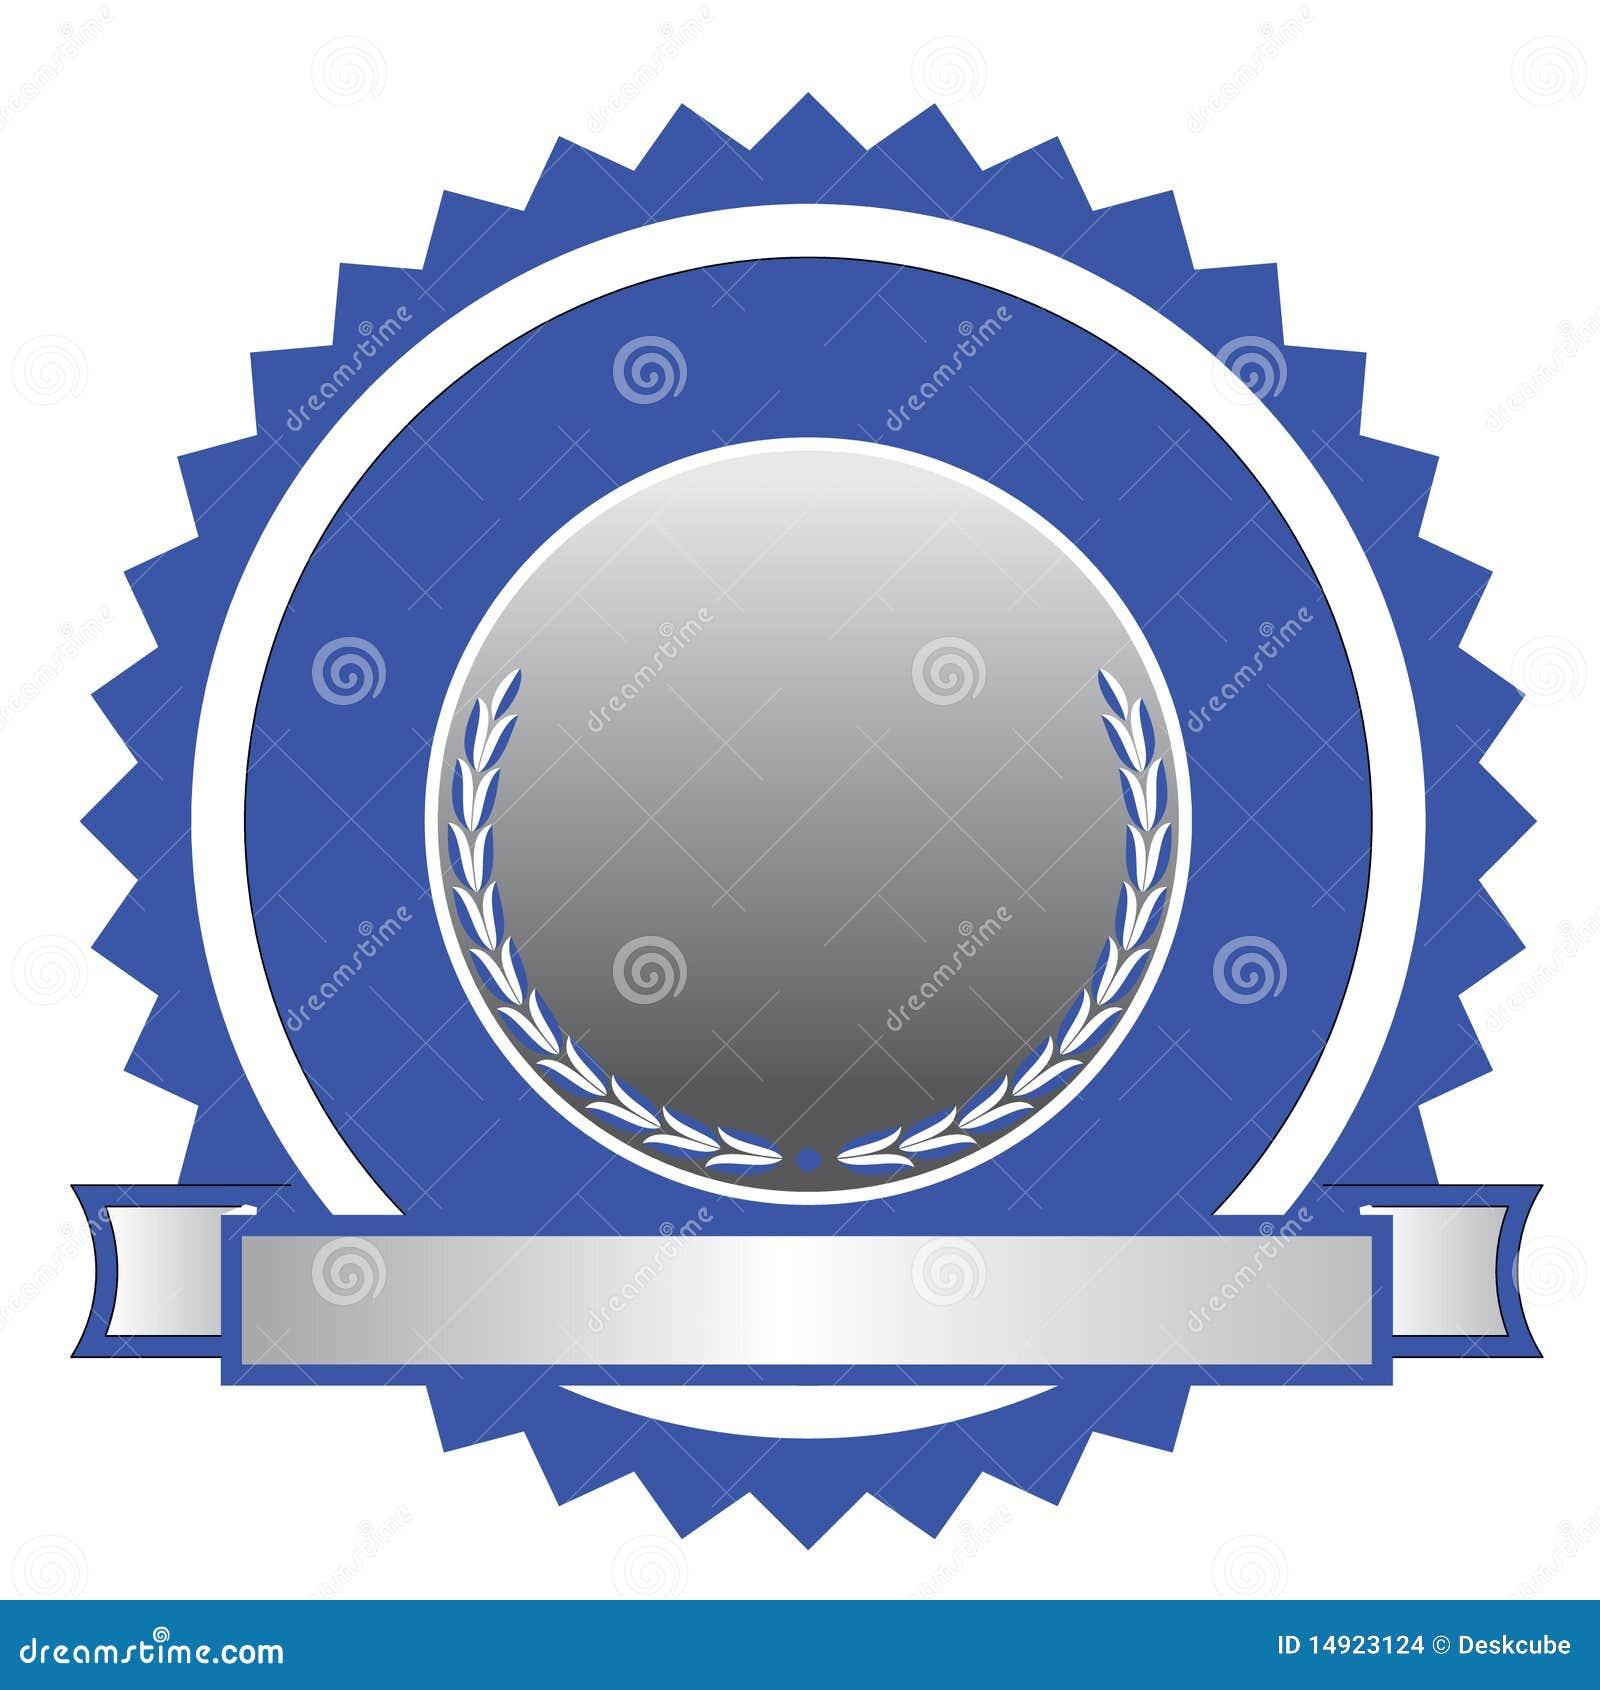 logo emblem certification stock illustrations 263 logo emblem